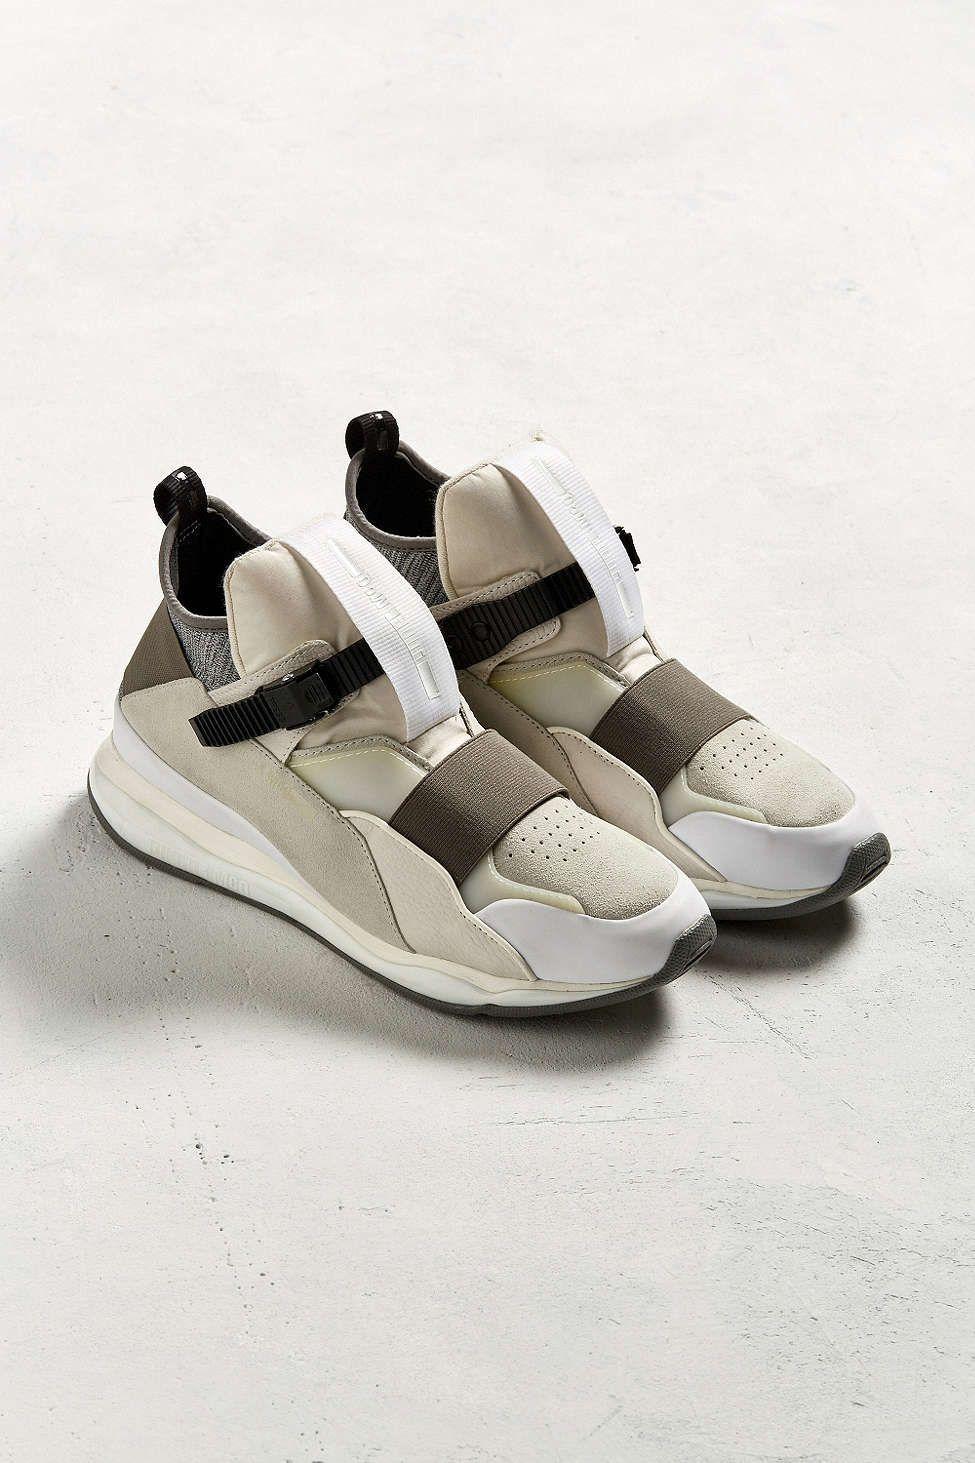 3779b5b2922 Puma X McQ By Alexander McQueen Cell Bubble Run Mid Sneaker ...